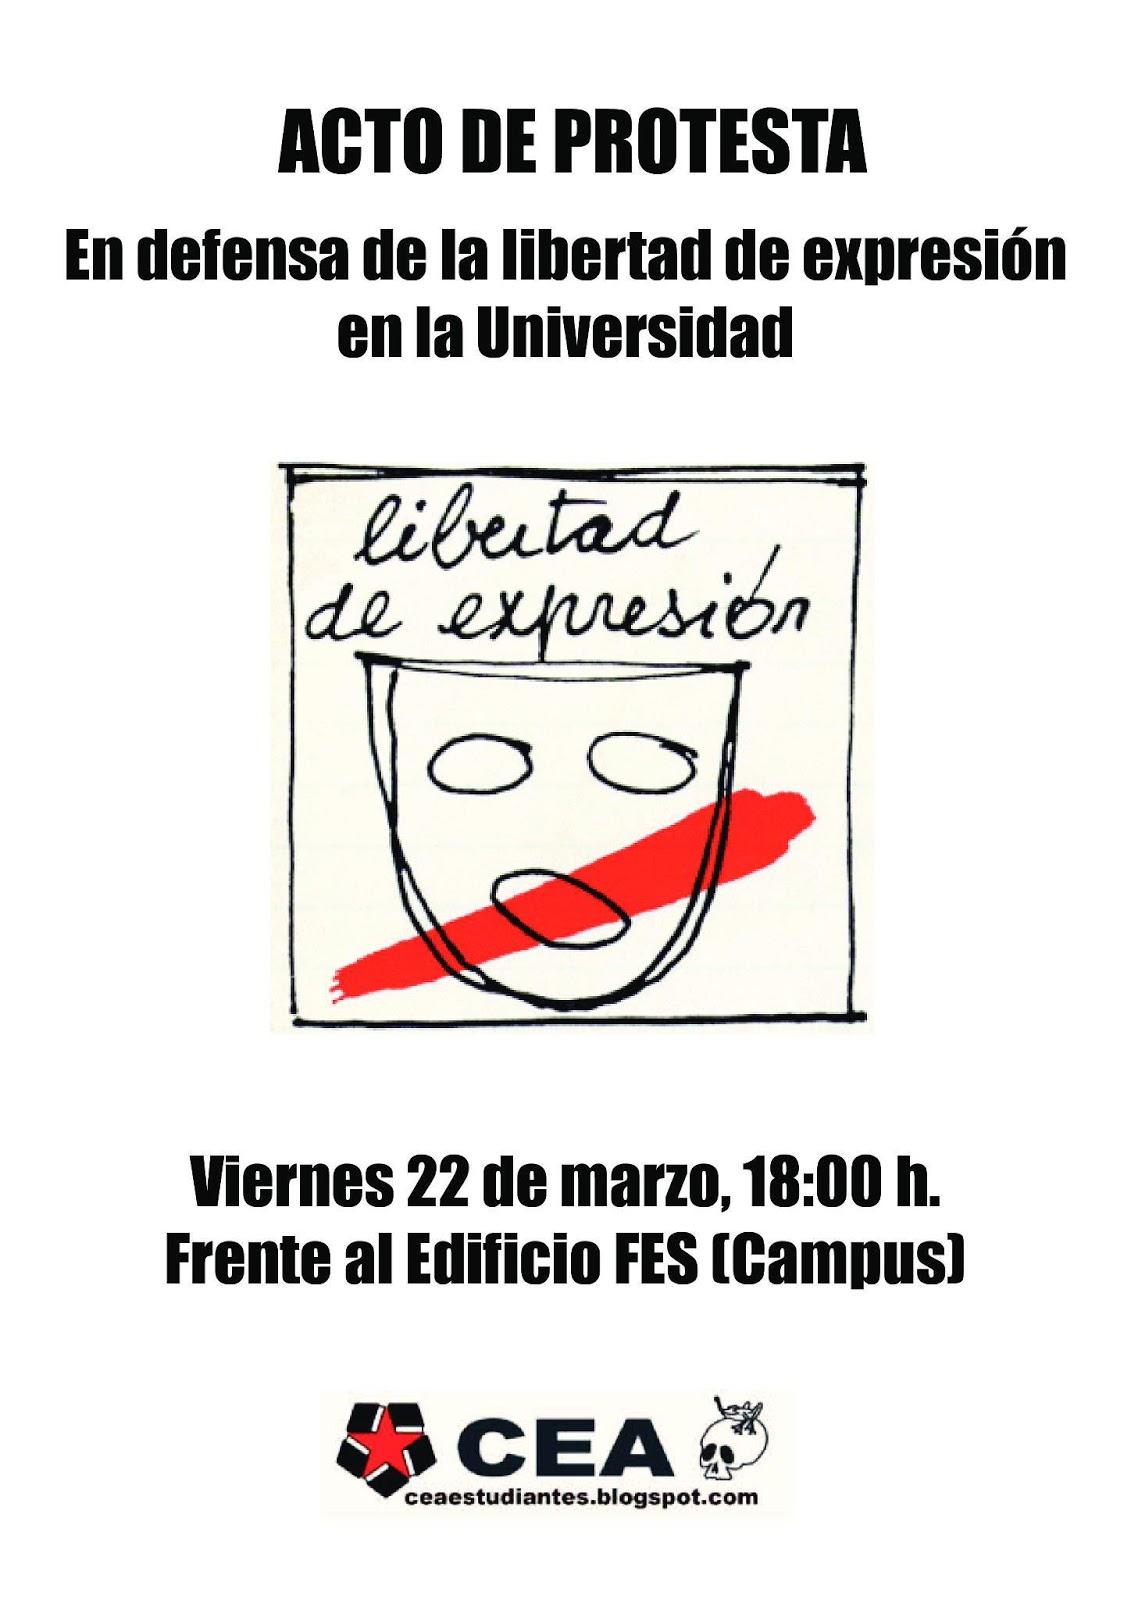 Colectivo Prometeo: Salamanca: Asalto del conservadurismo